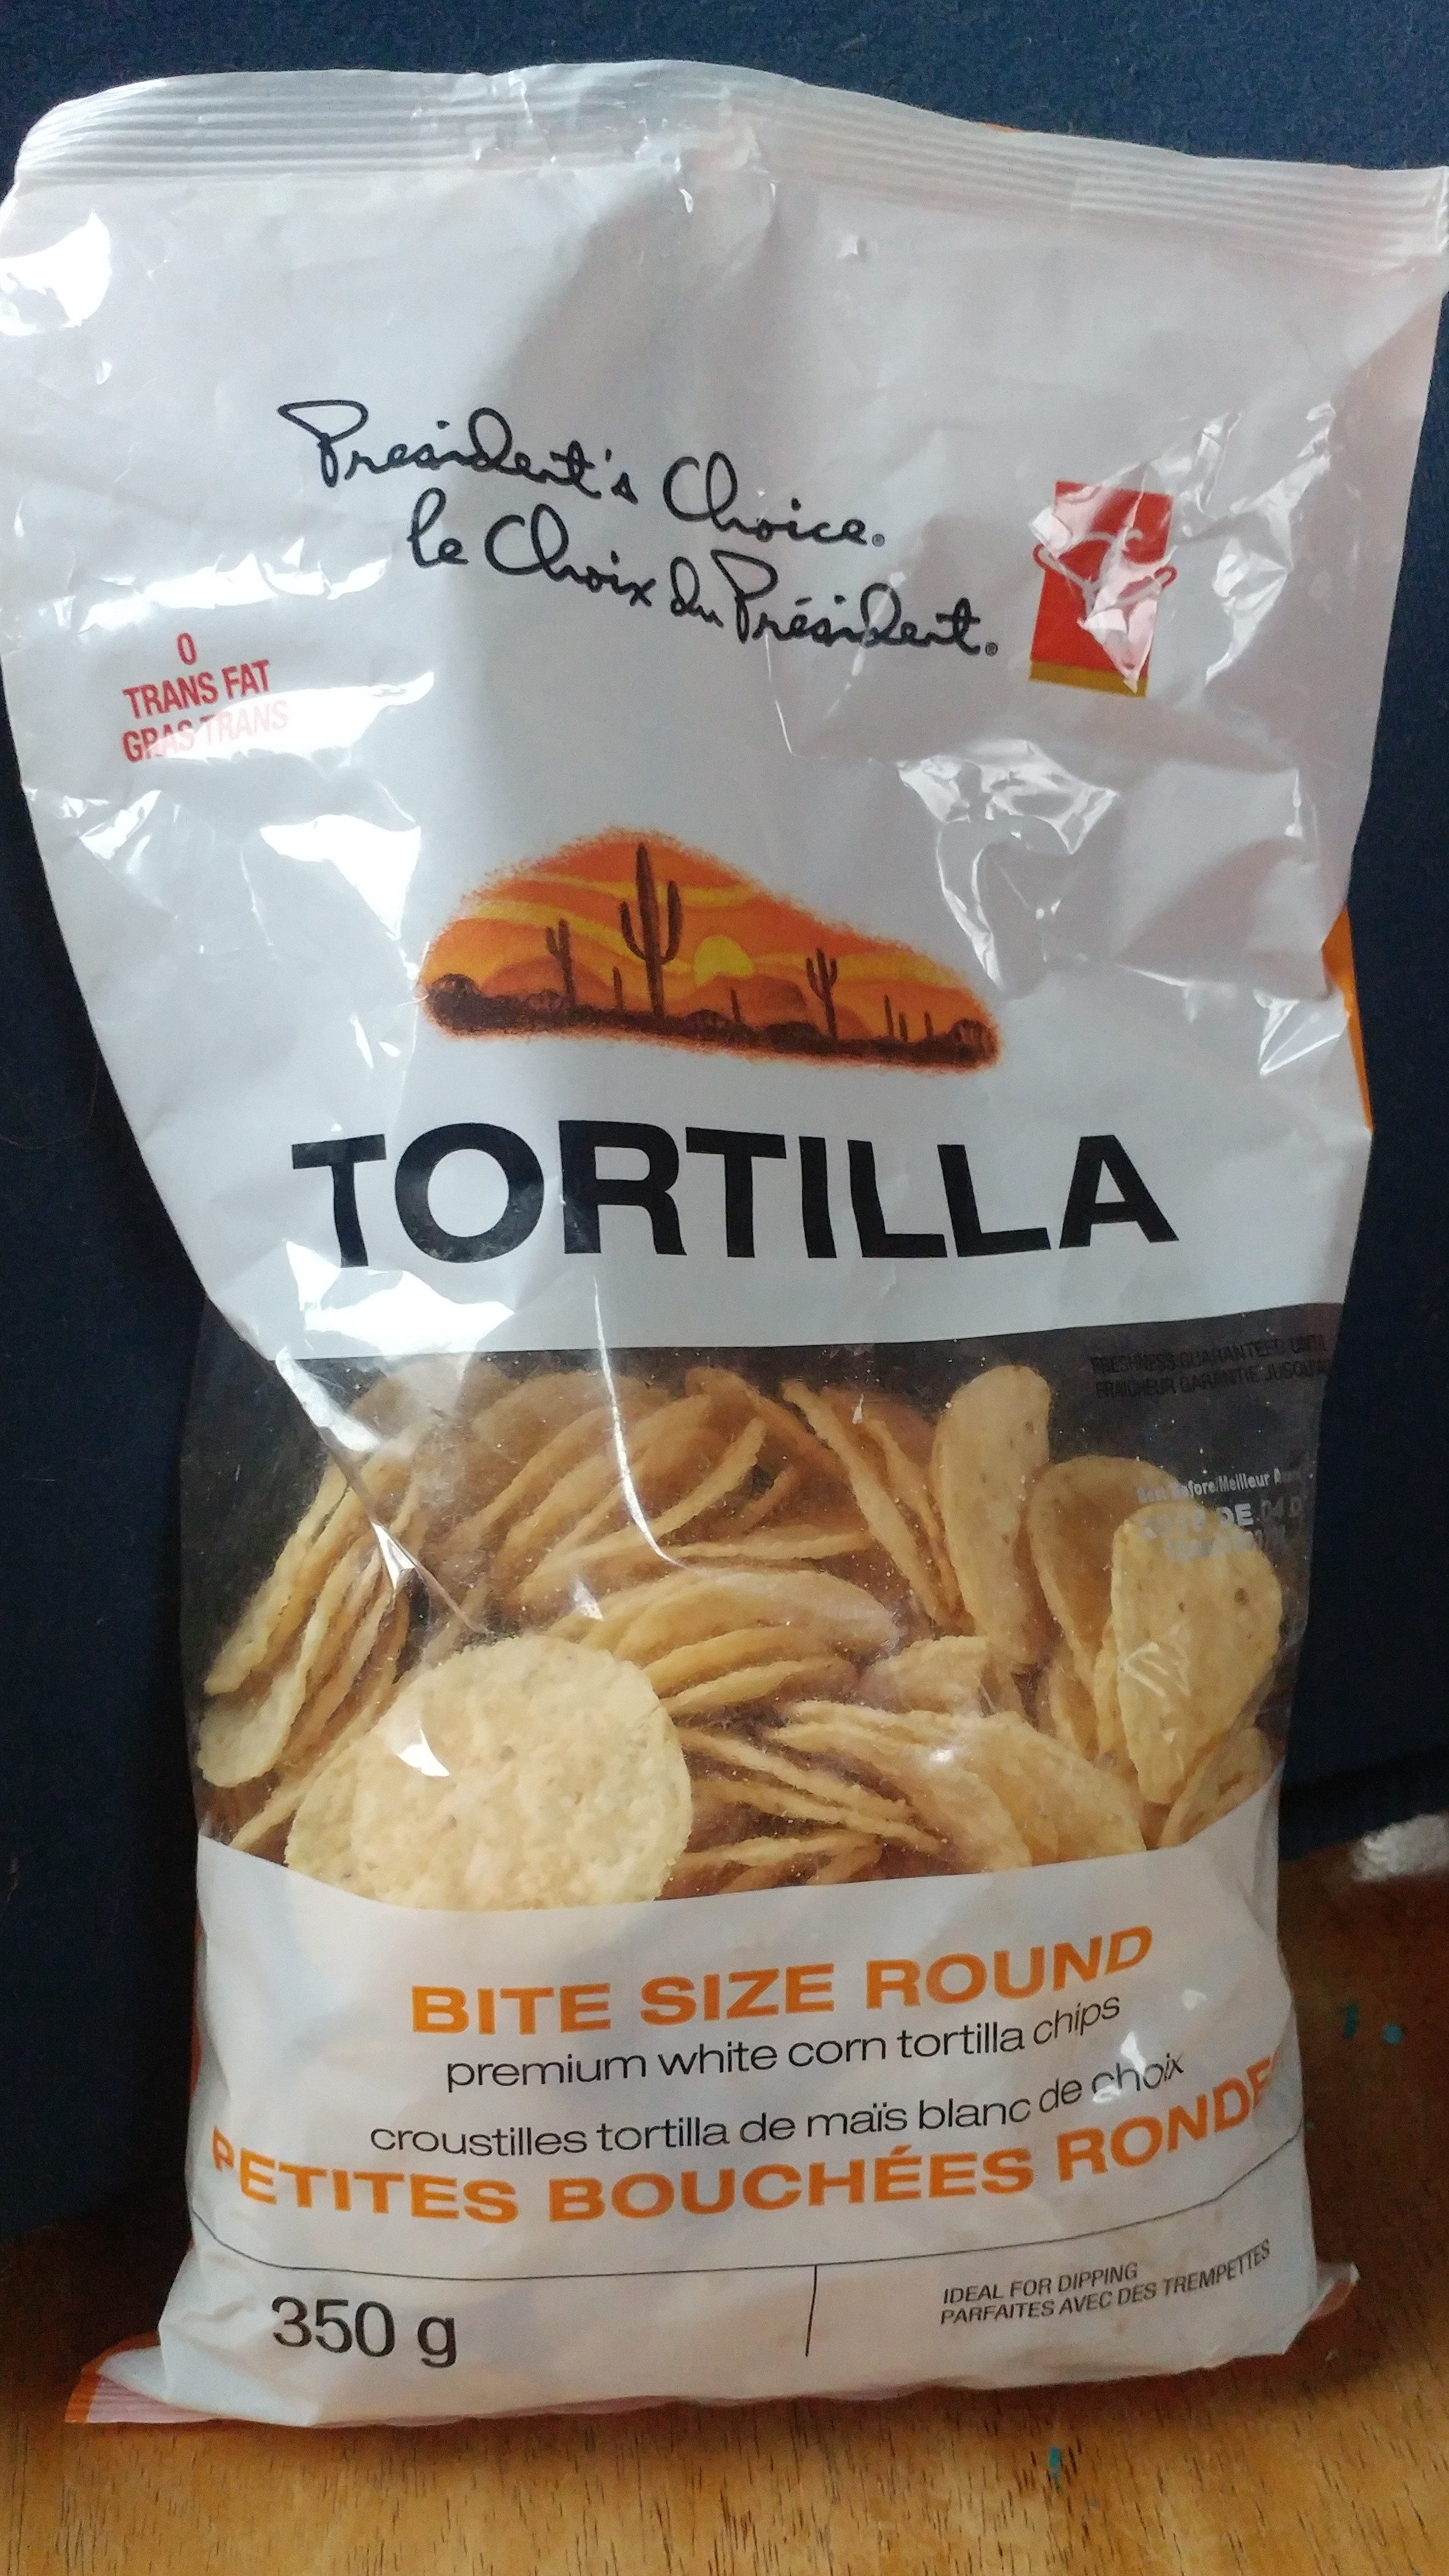 Tortilla bite size round premium white corn tortilla chips - Produit - en